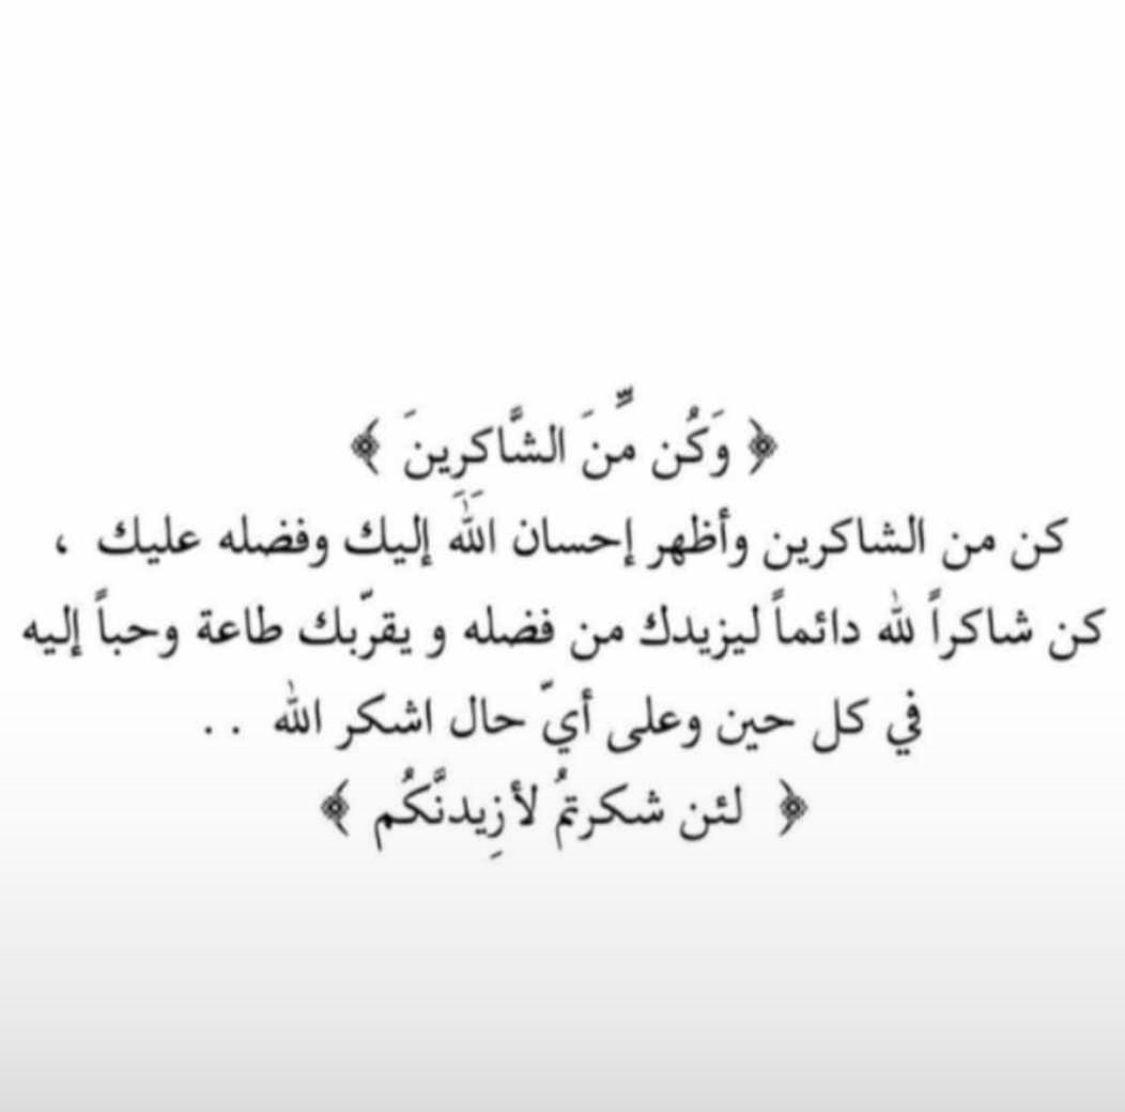 كن من الشاكرين Calligraphy Arabic Calligraphy Arabic